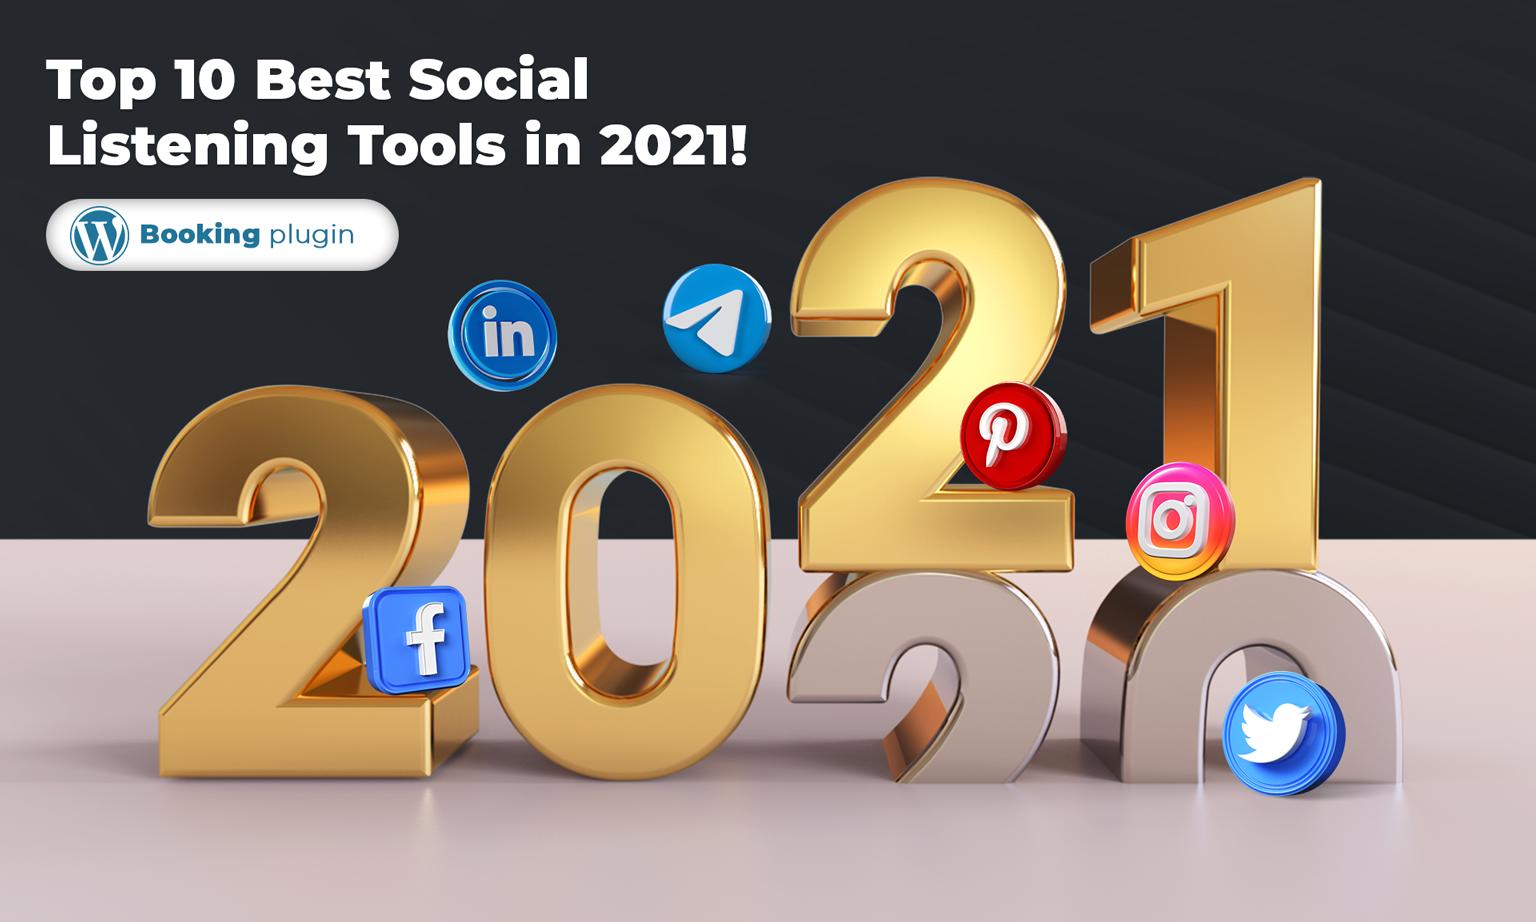 Top 10 Best Social Listening Tools in 2021